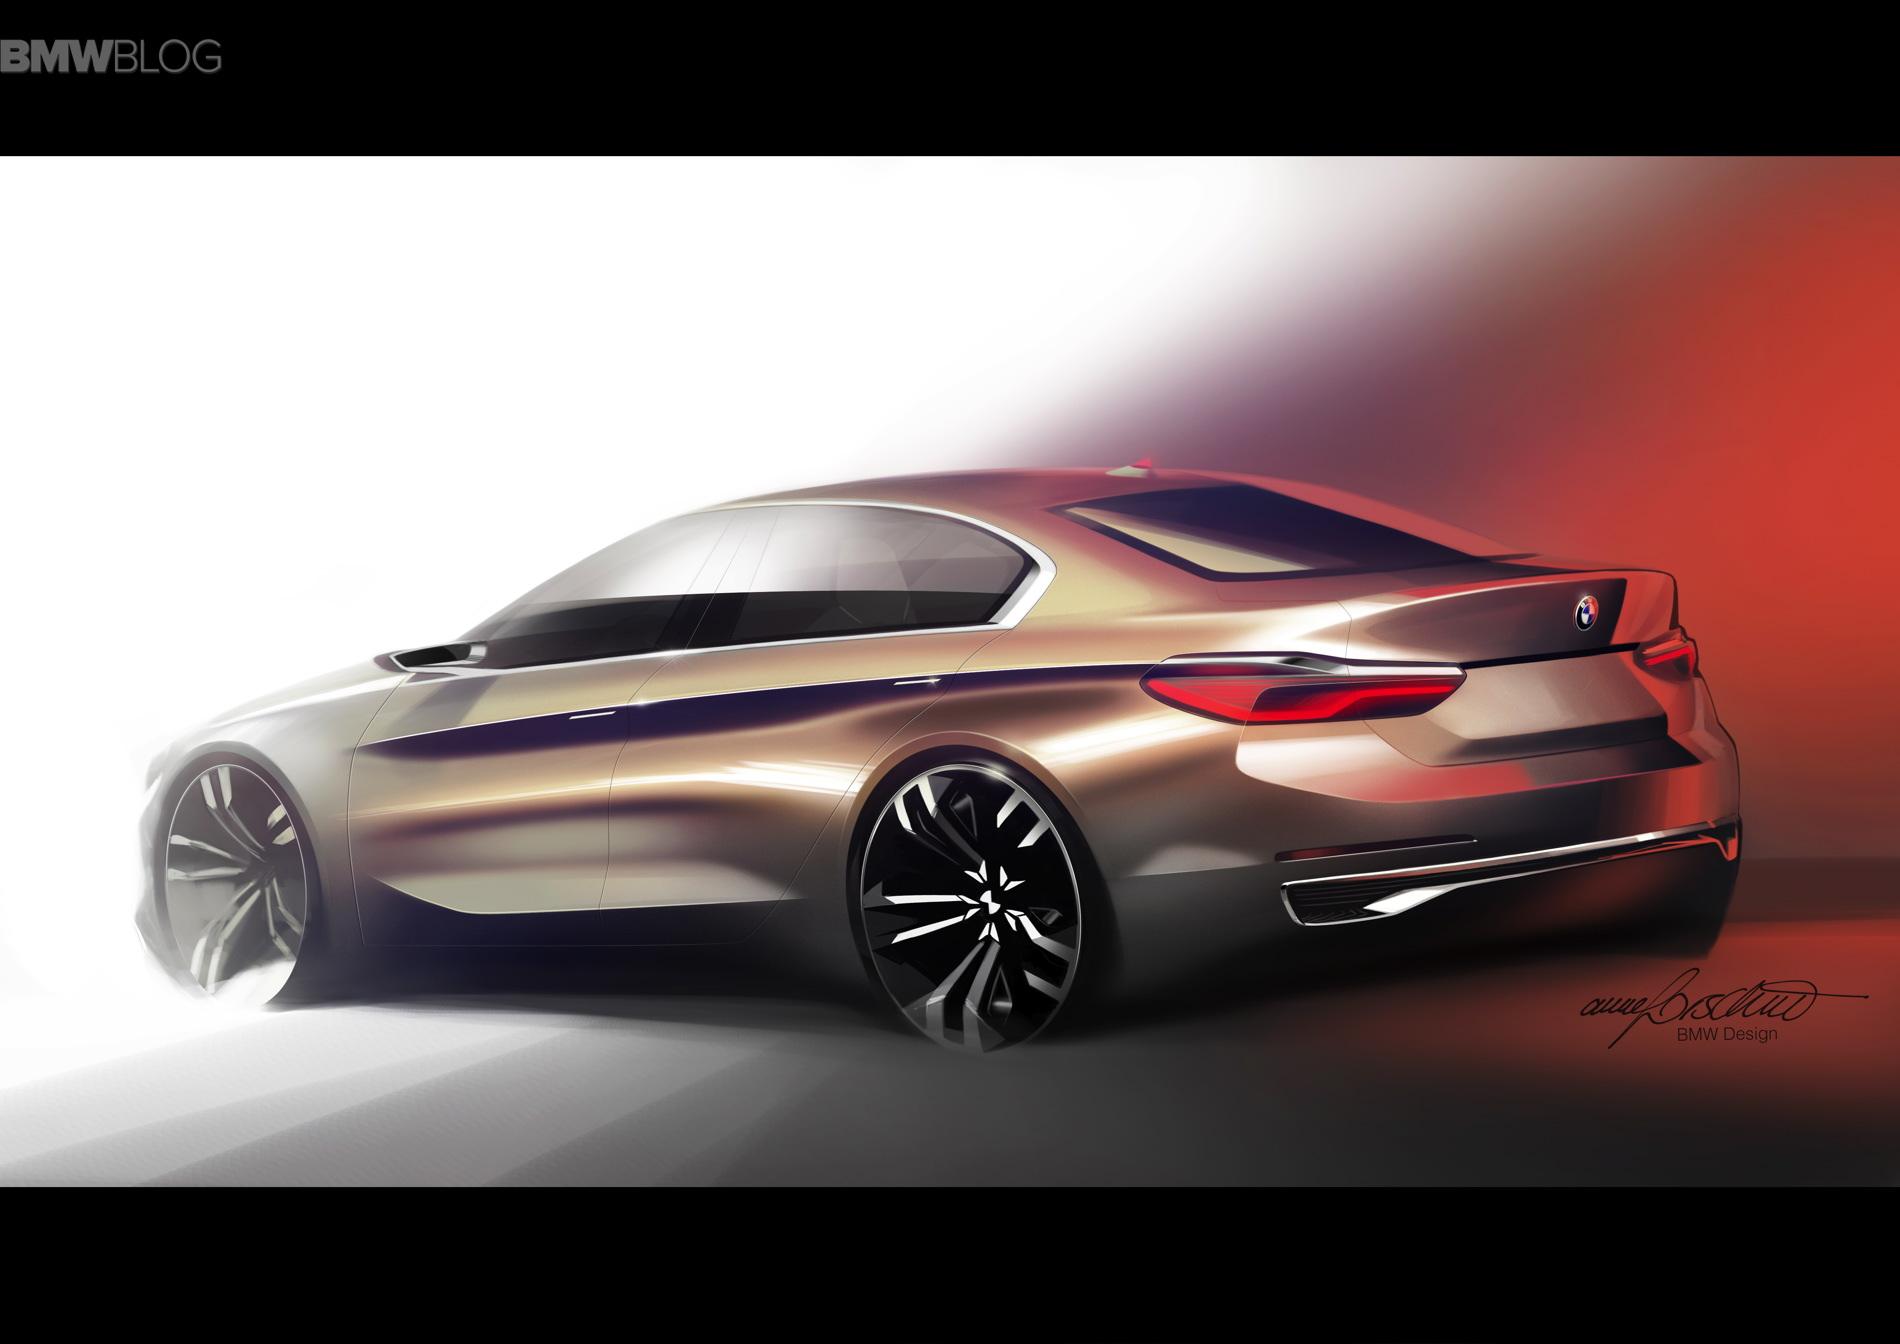 BMW Concept Compact Sedan images 20